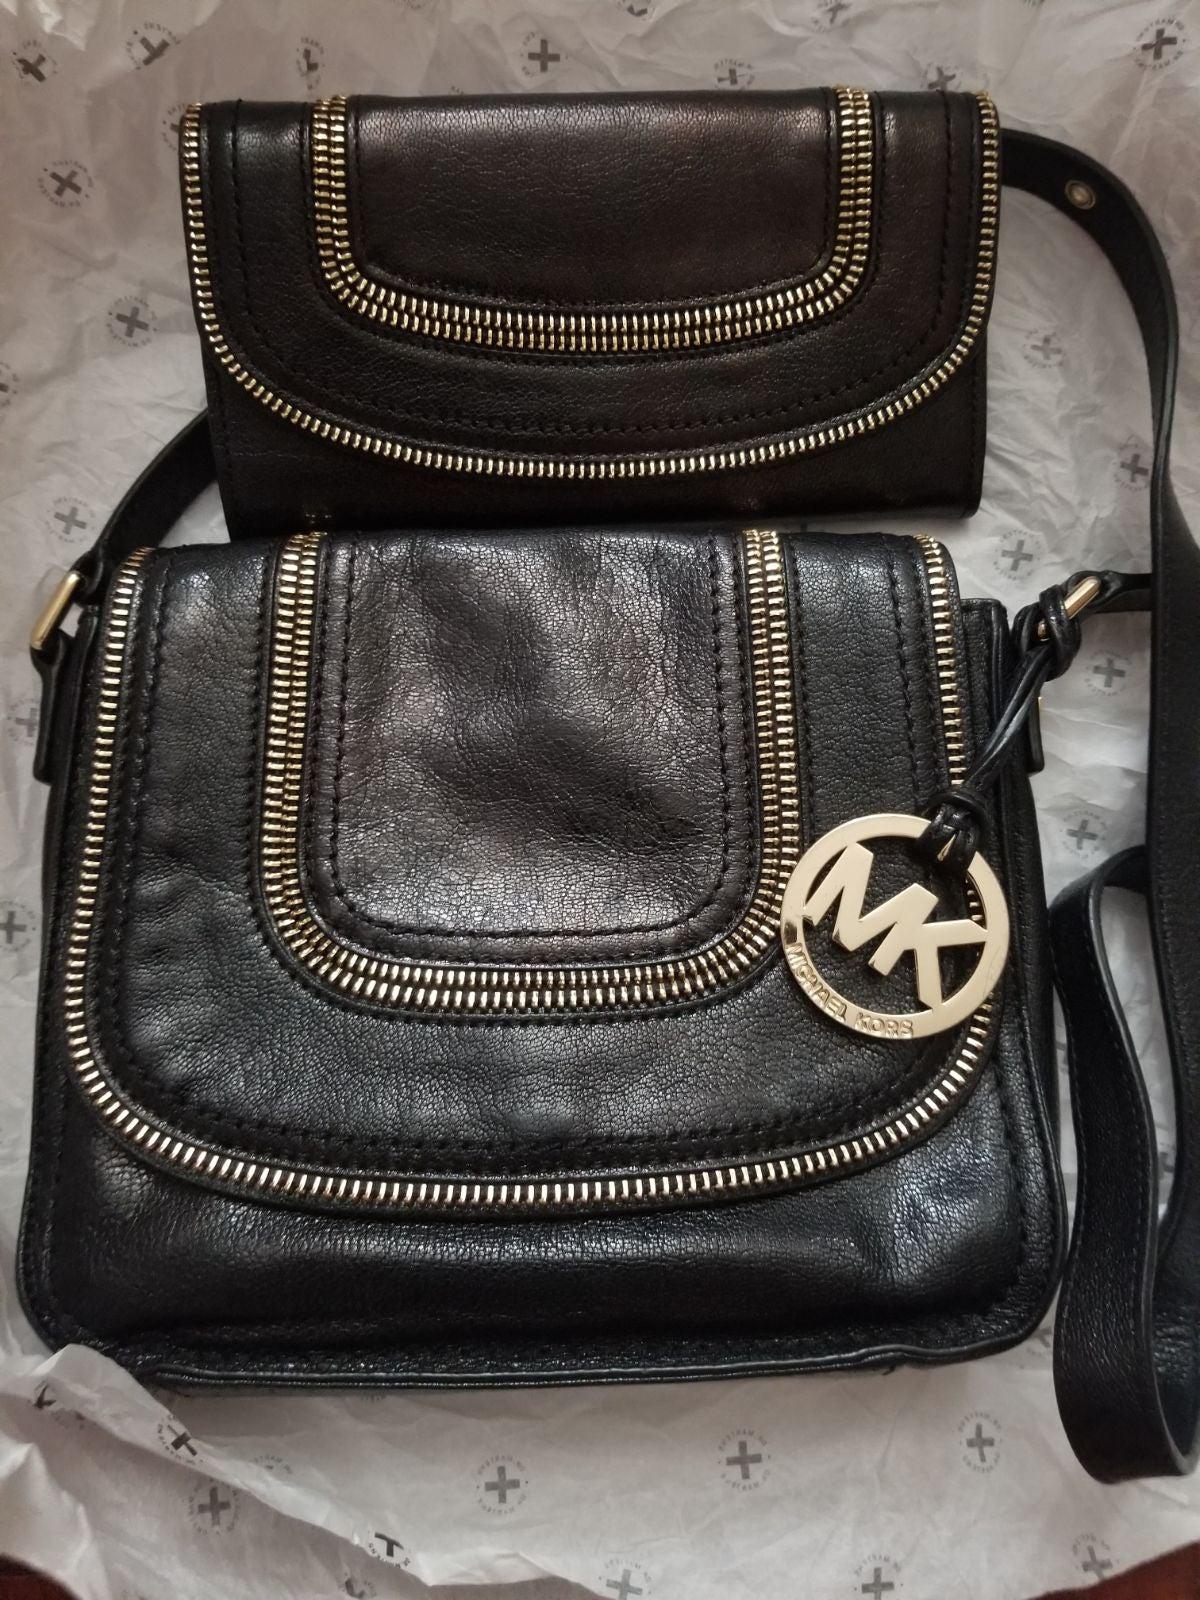 Michael Kors Naomi purse and wallet